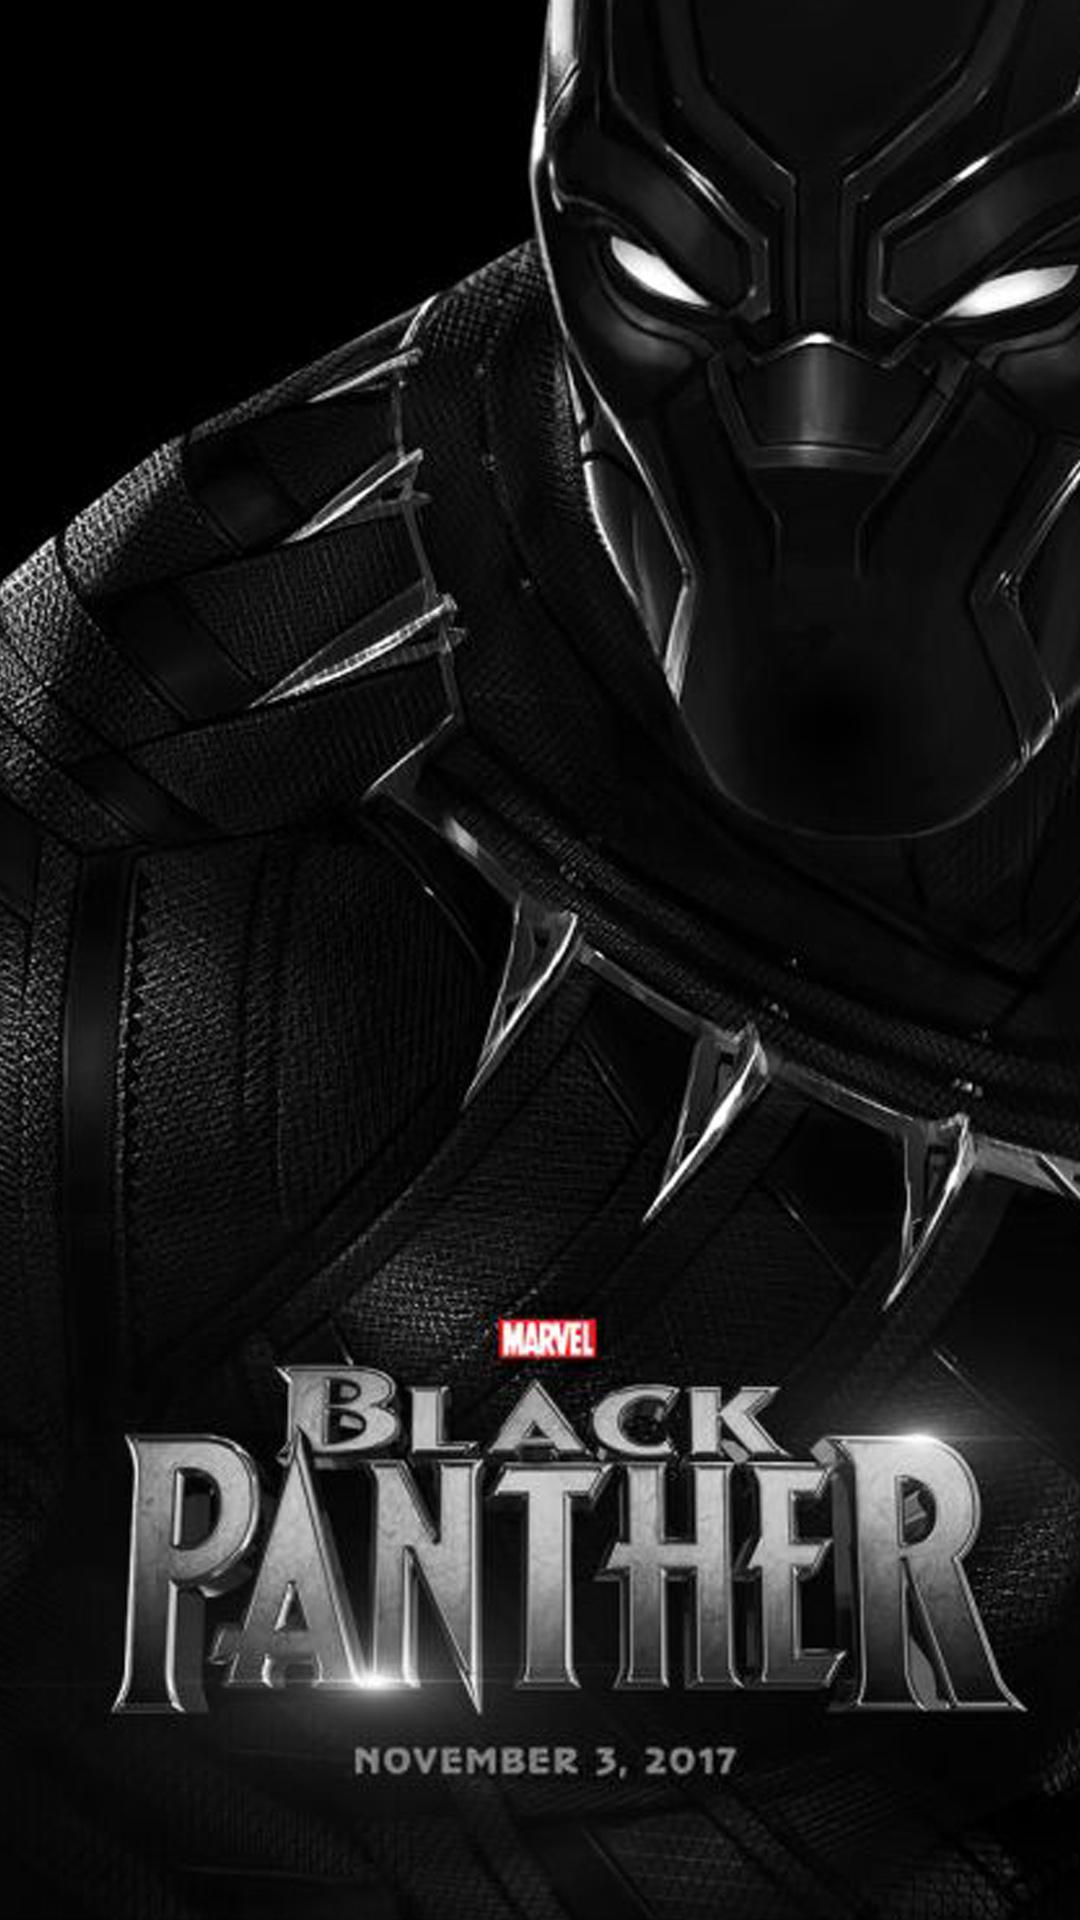 Black Panther Movie Wallpaper Hd Hd